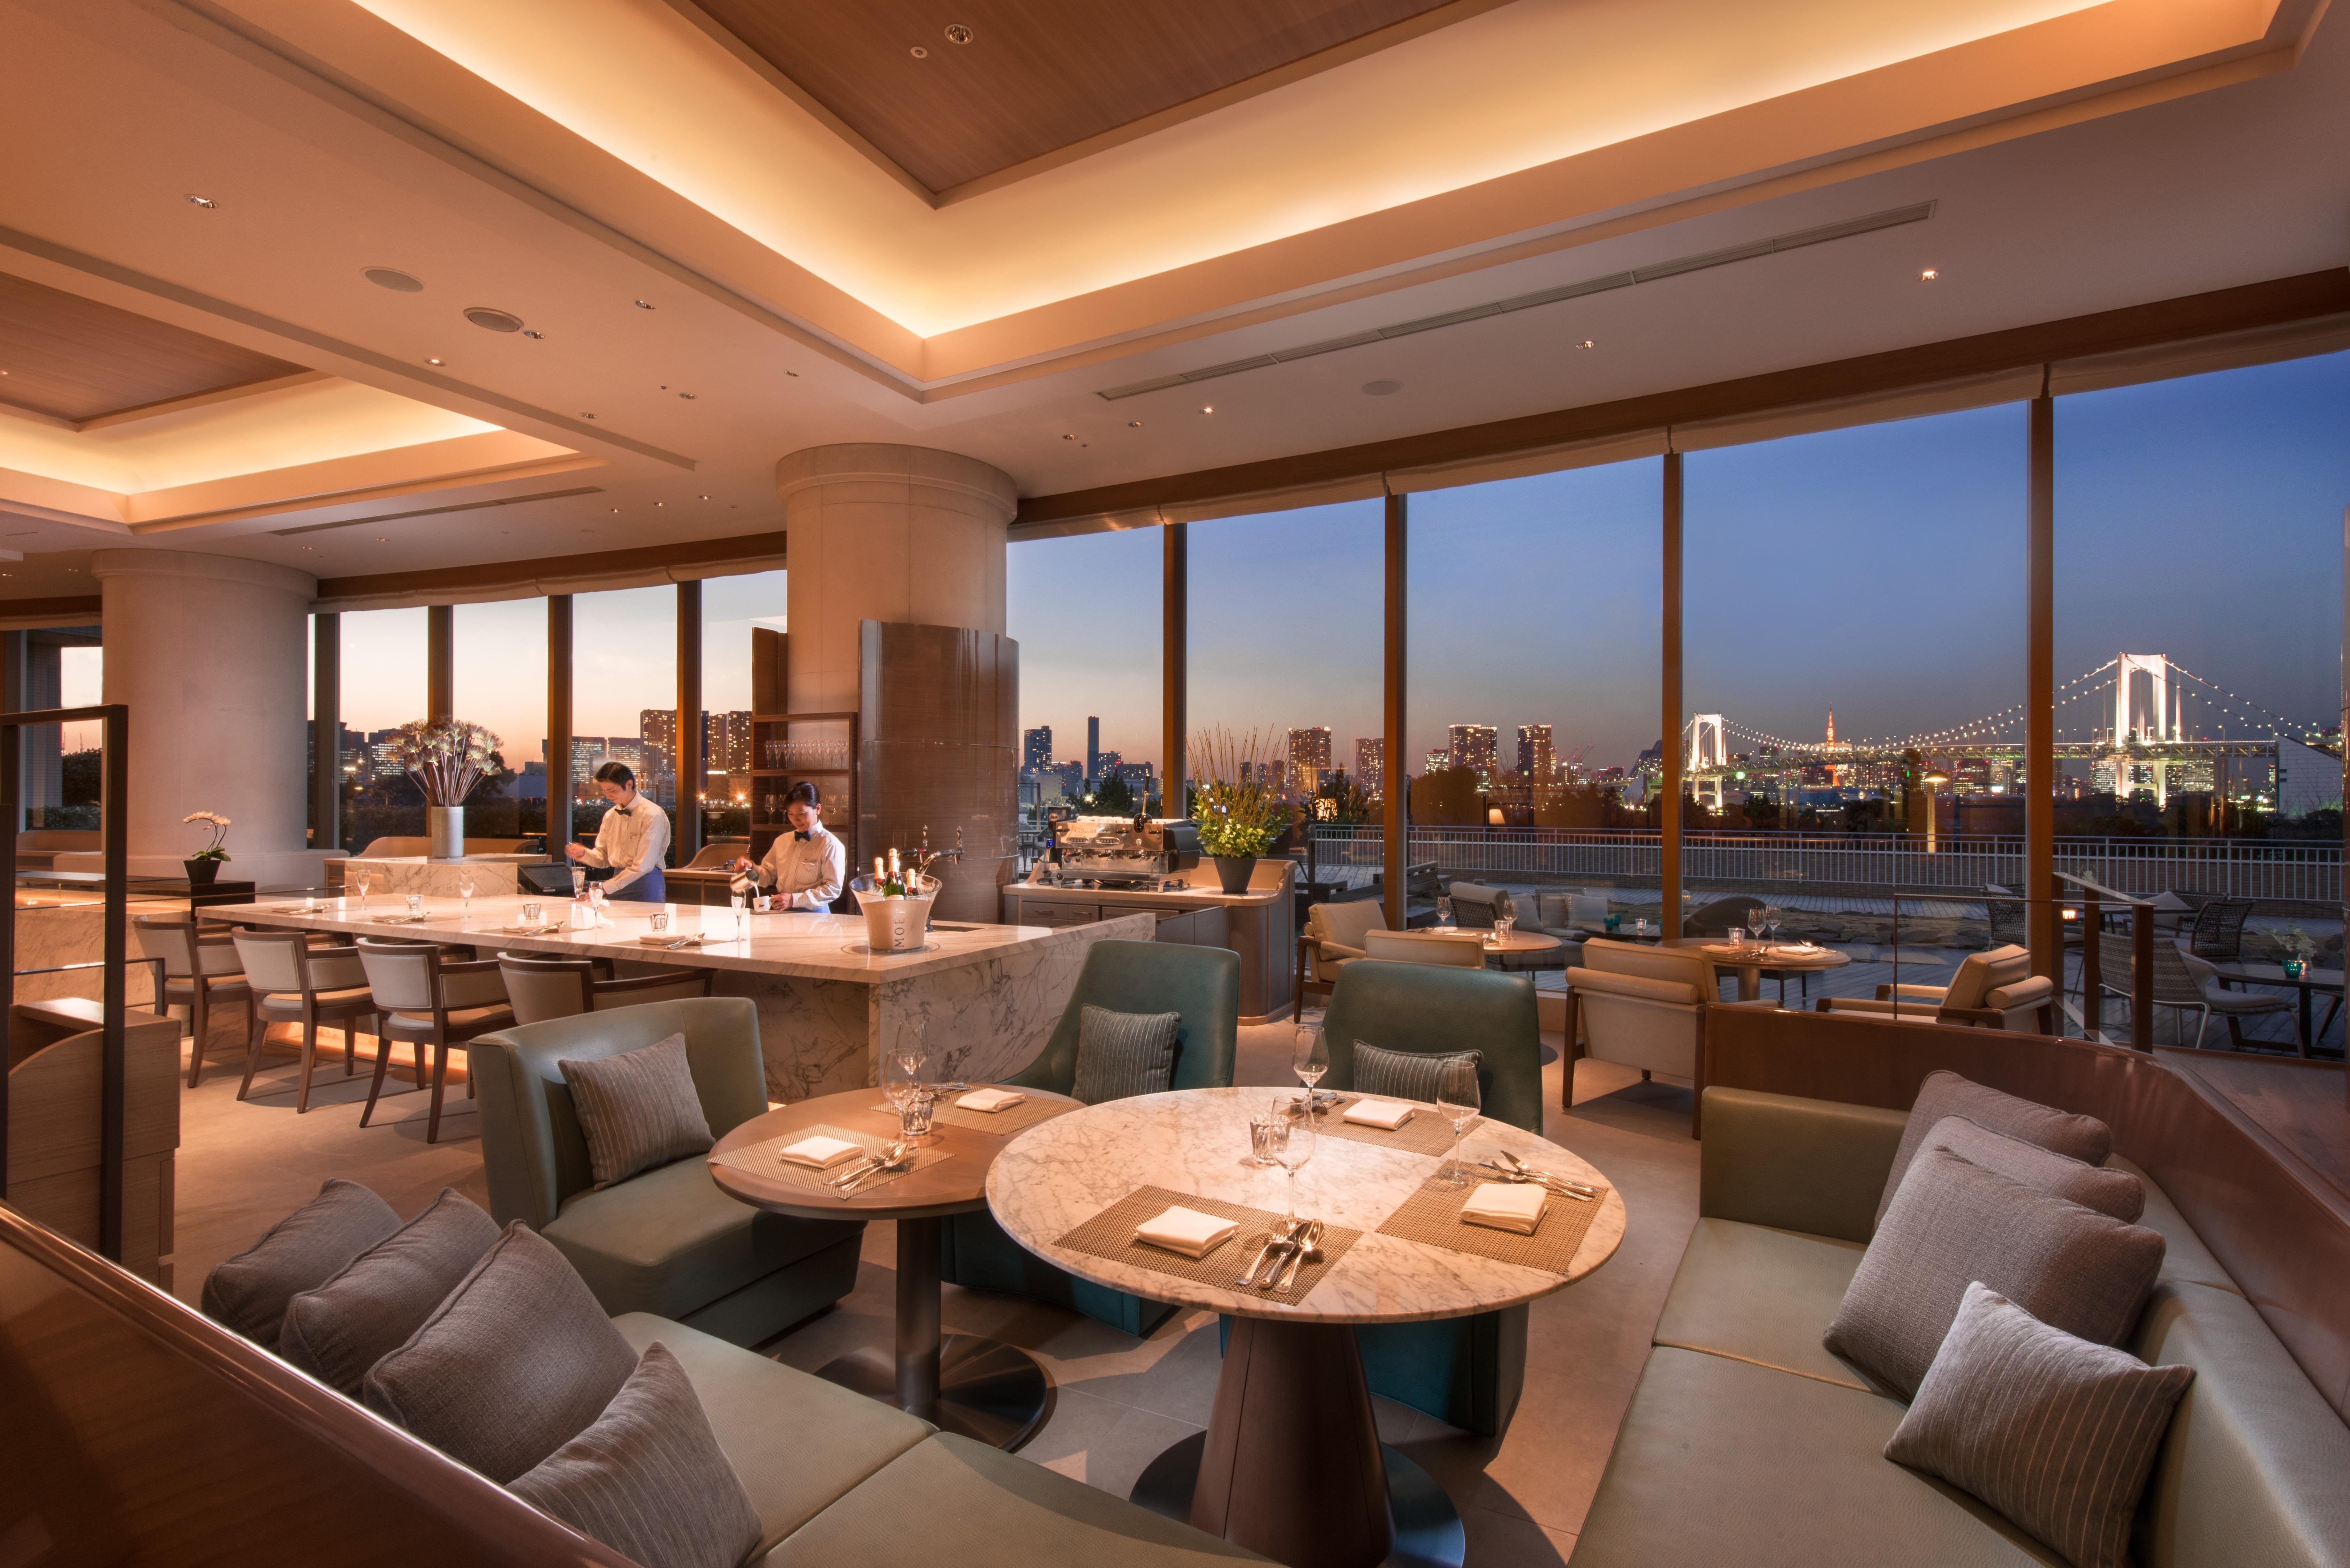 Tokyo Discount Hotels Awesome the 10 Best Restaurants Near Hilton tokyo Odaiba Tripadvisor